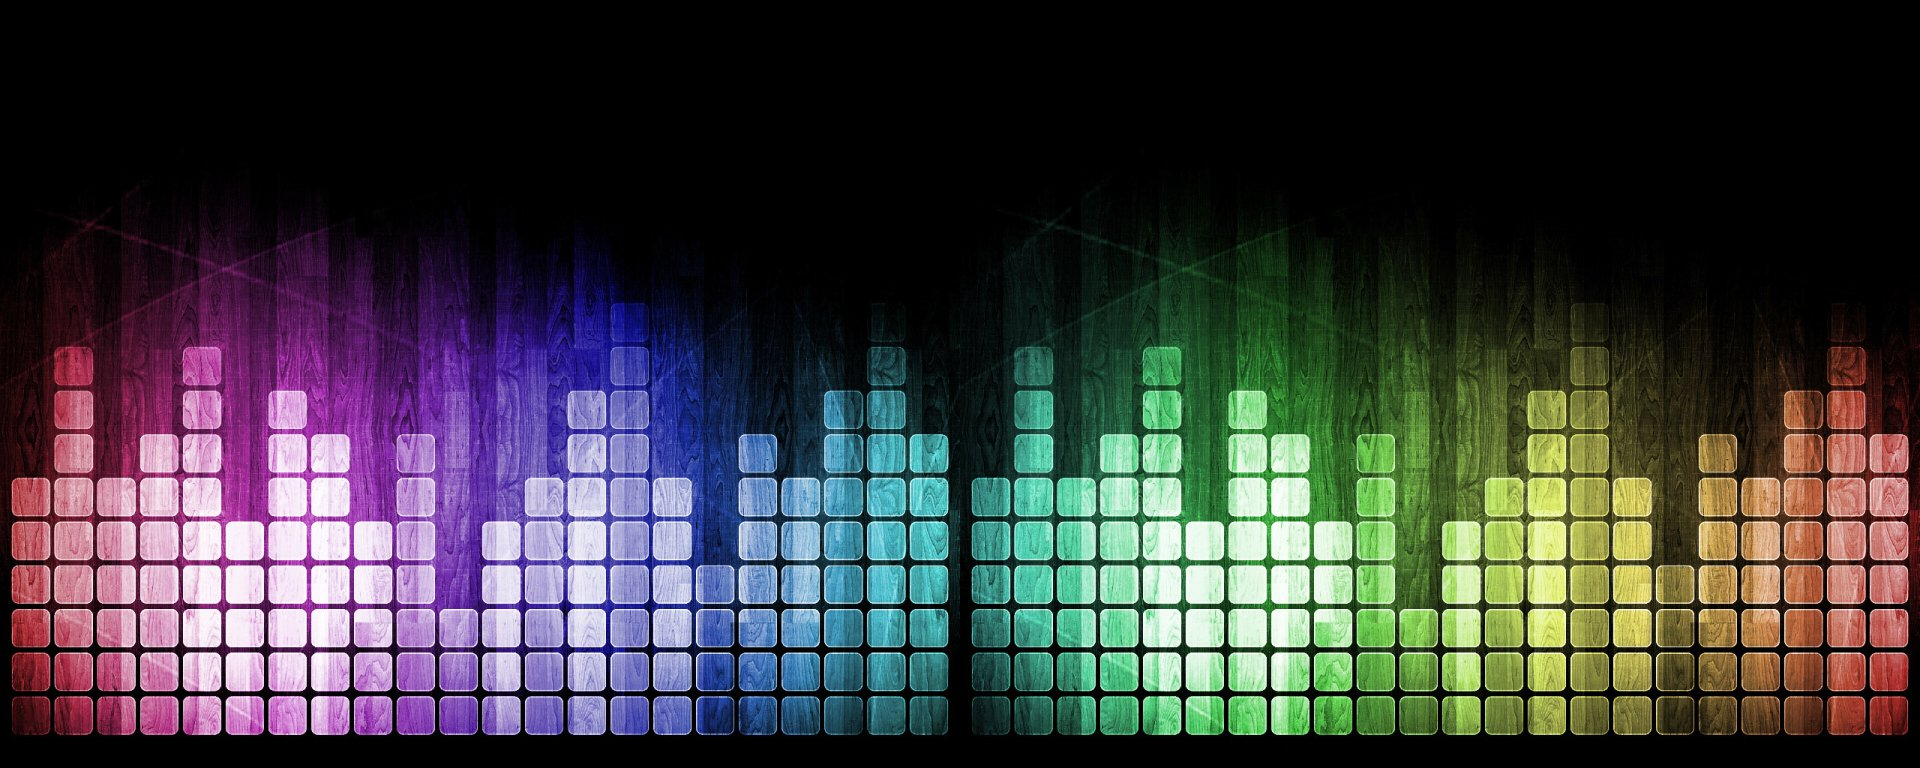 Musik - Künstlerisch  Wallpaper